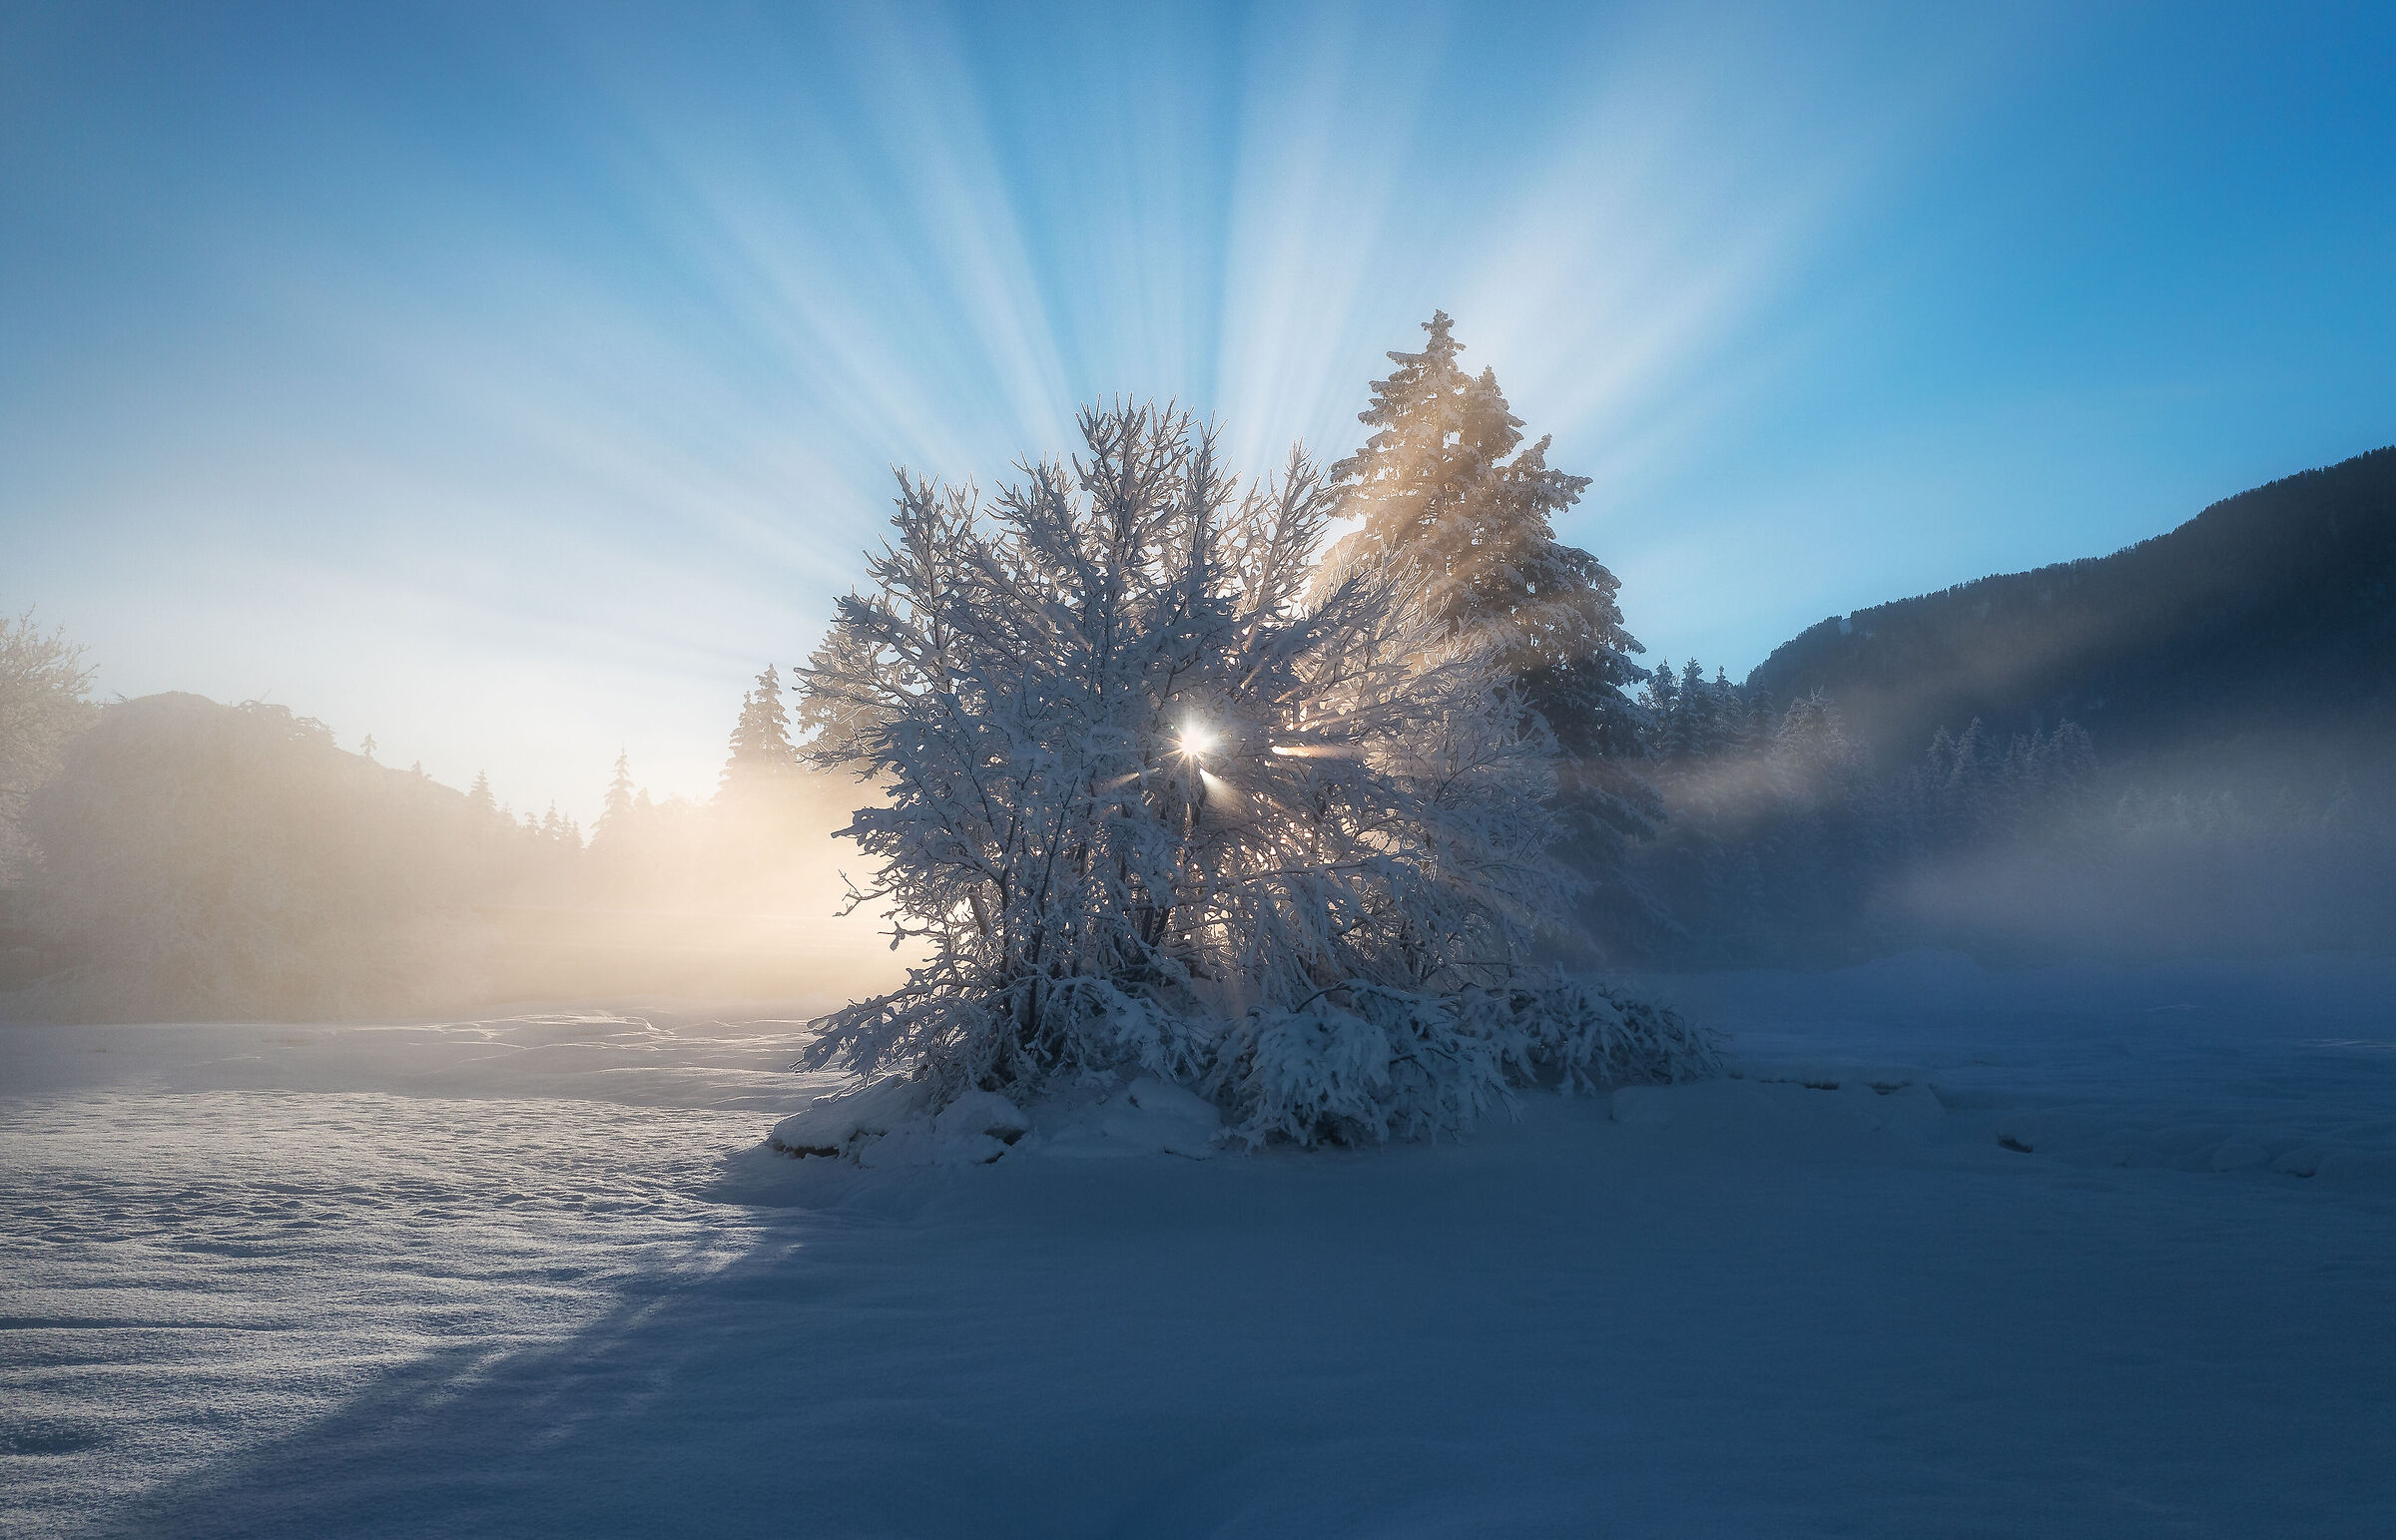 Frozen fairytale...